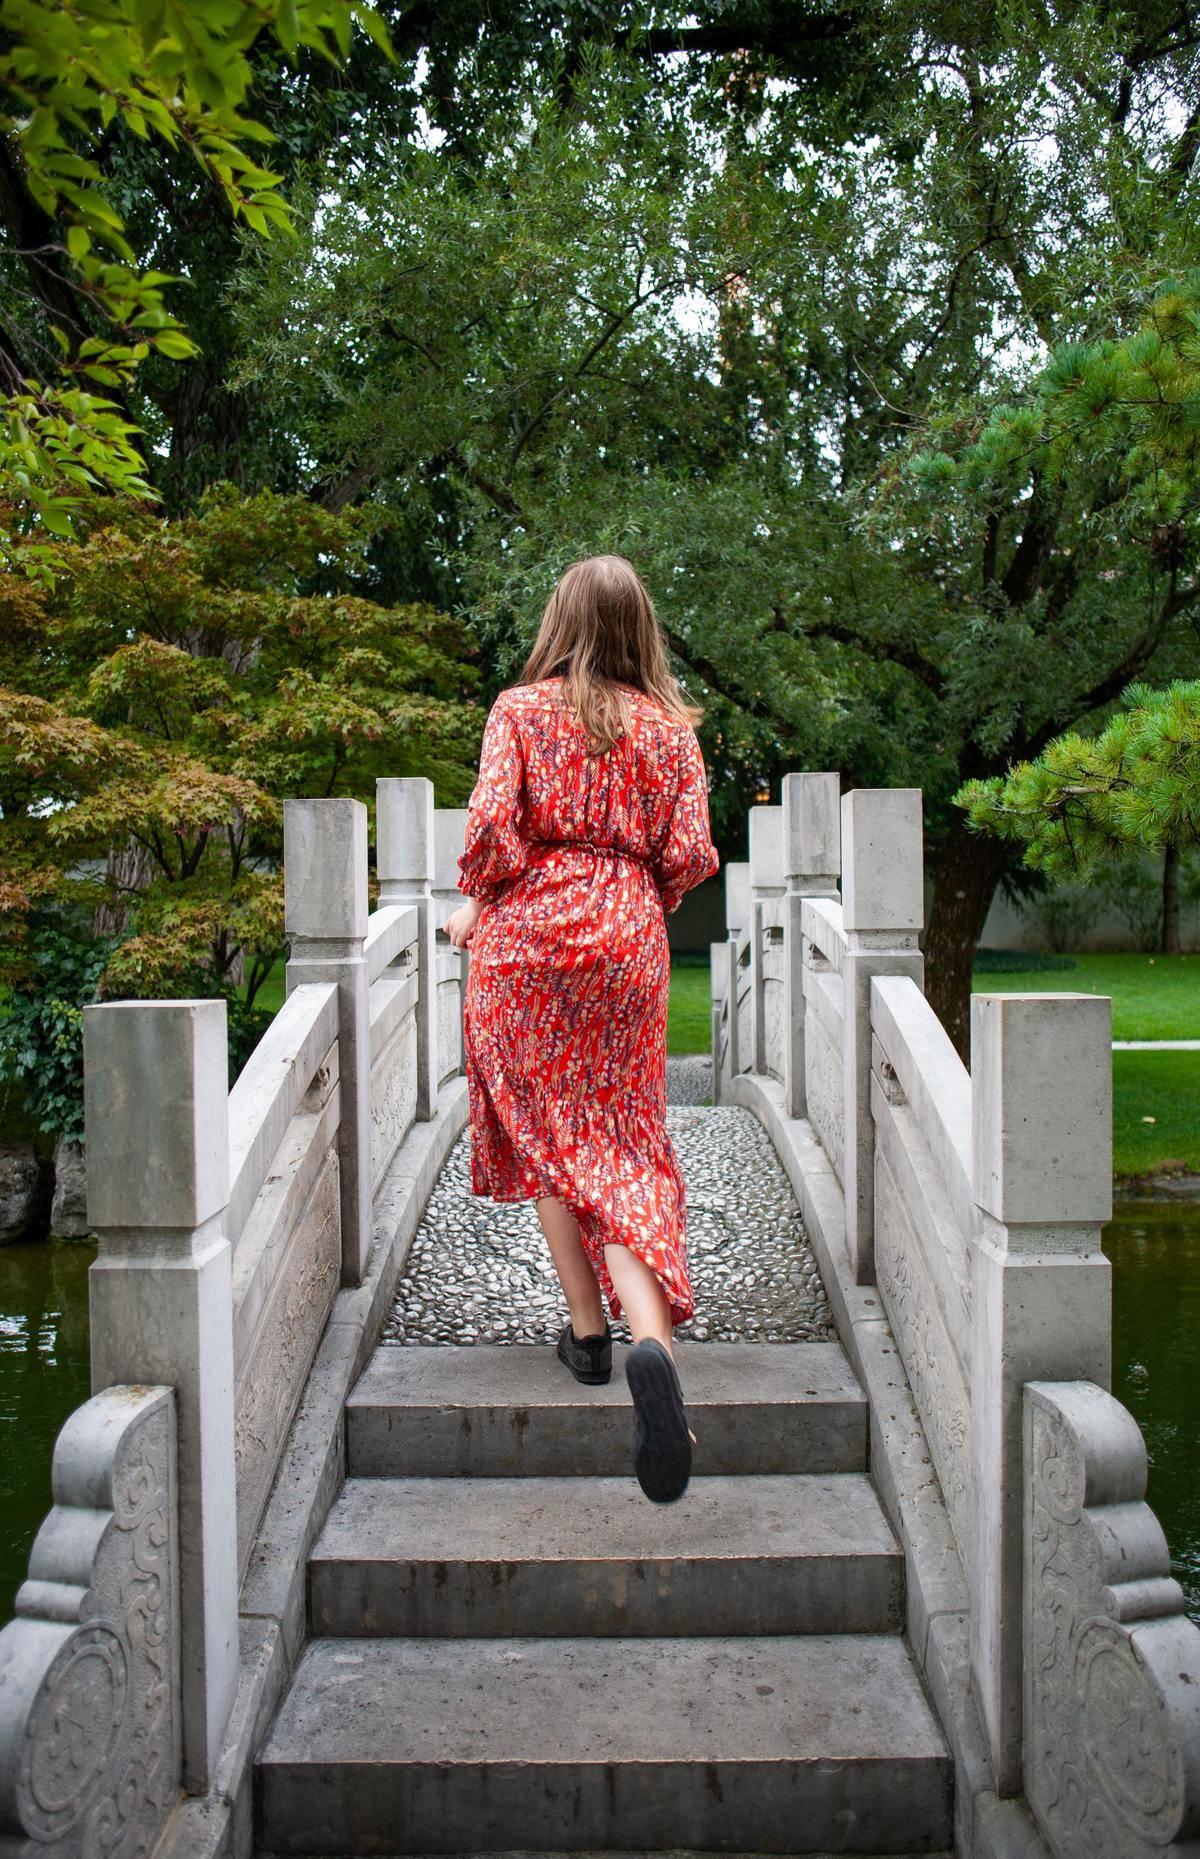 woman swaying her hips as she walks across a bridge